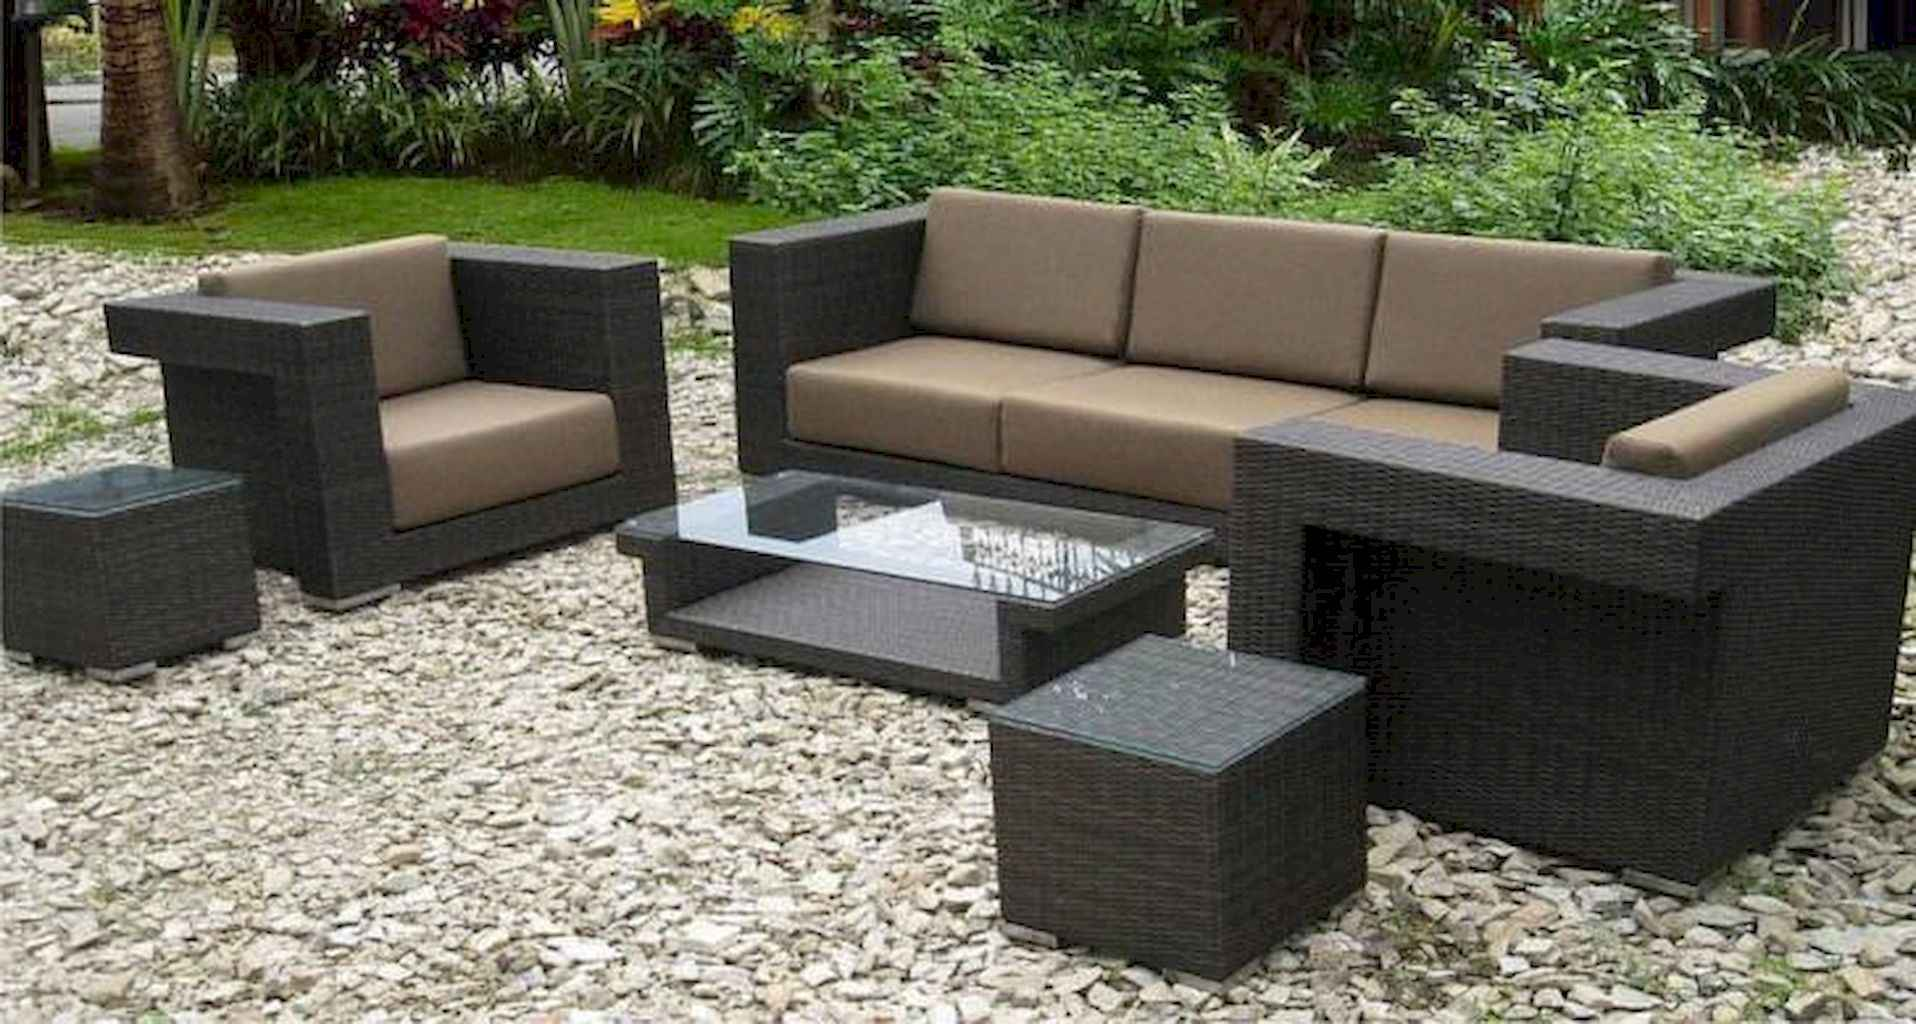 Top 25 Stunning Backyard Patio Design Ideas (5)